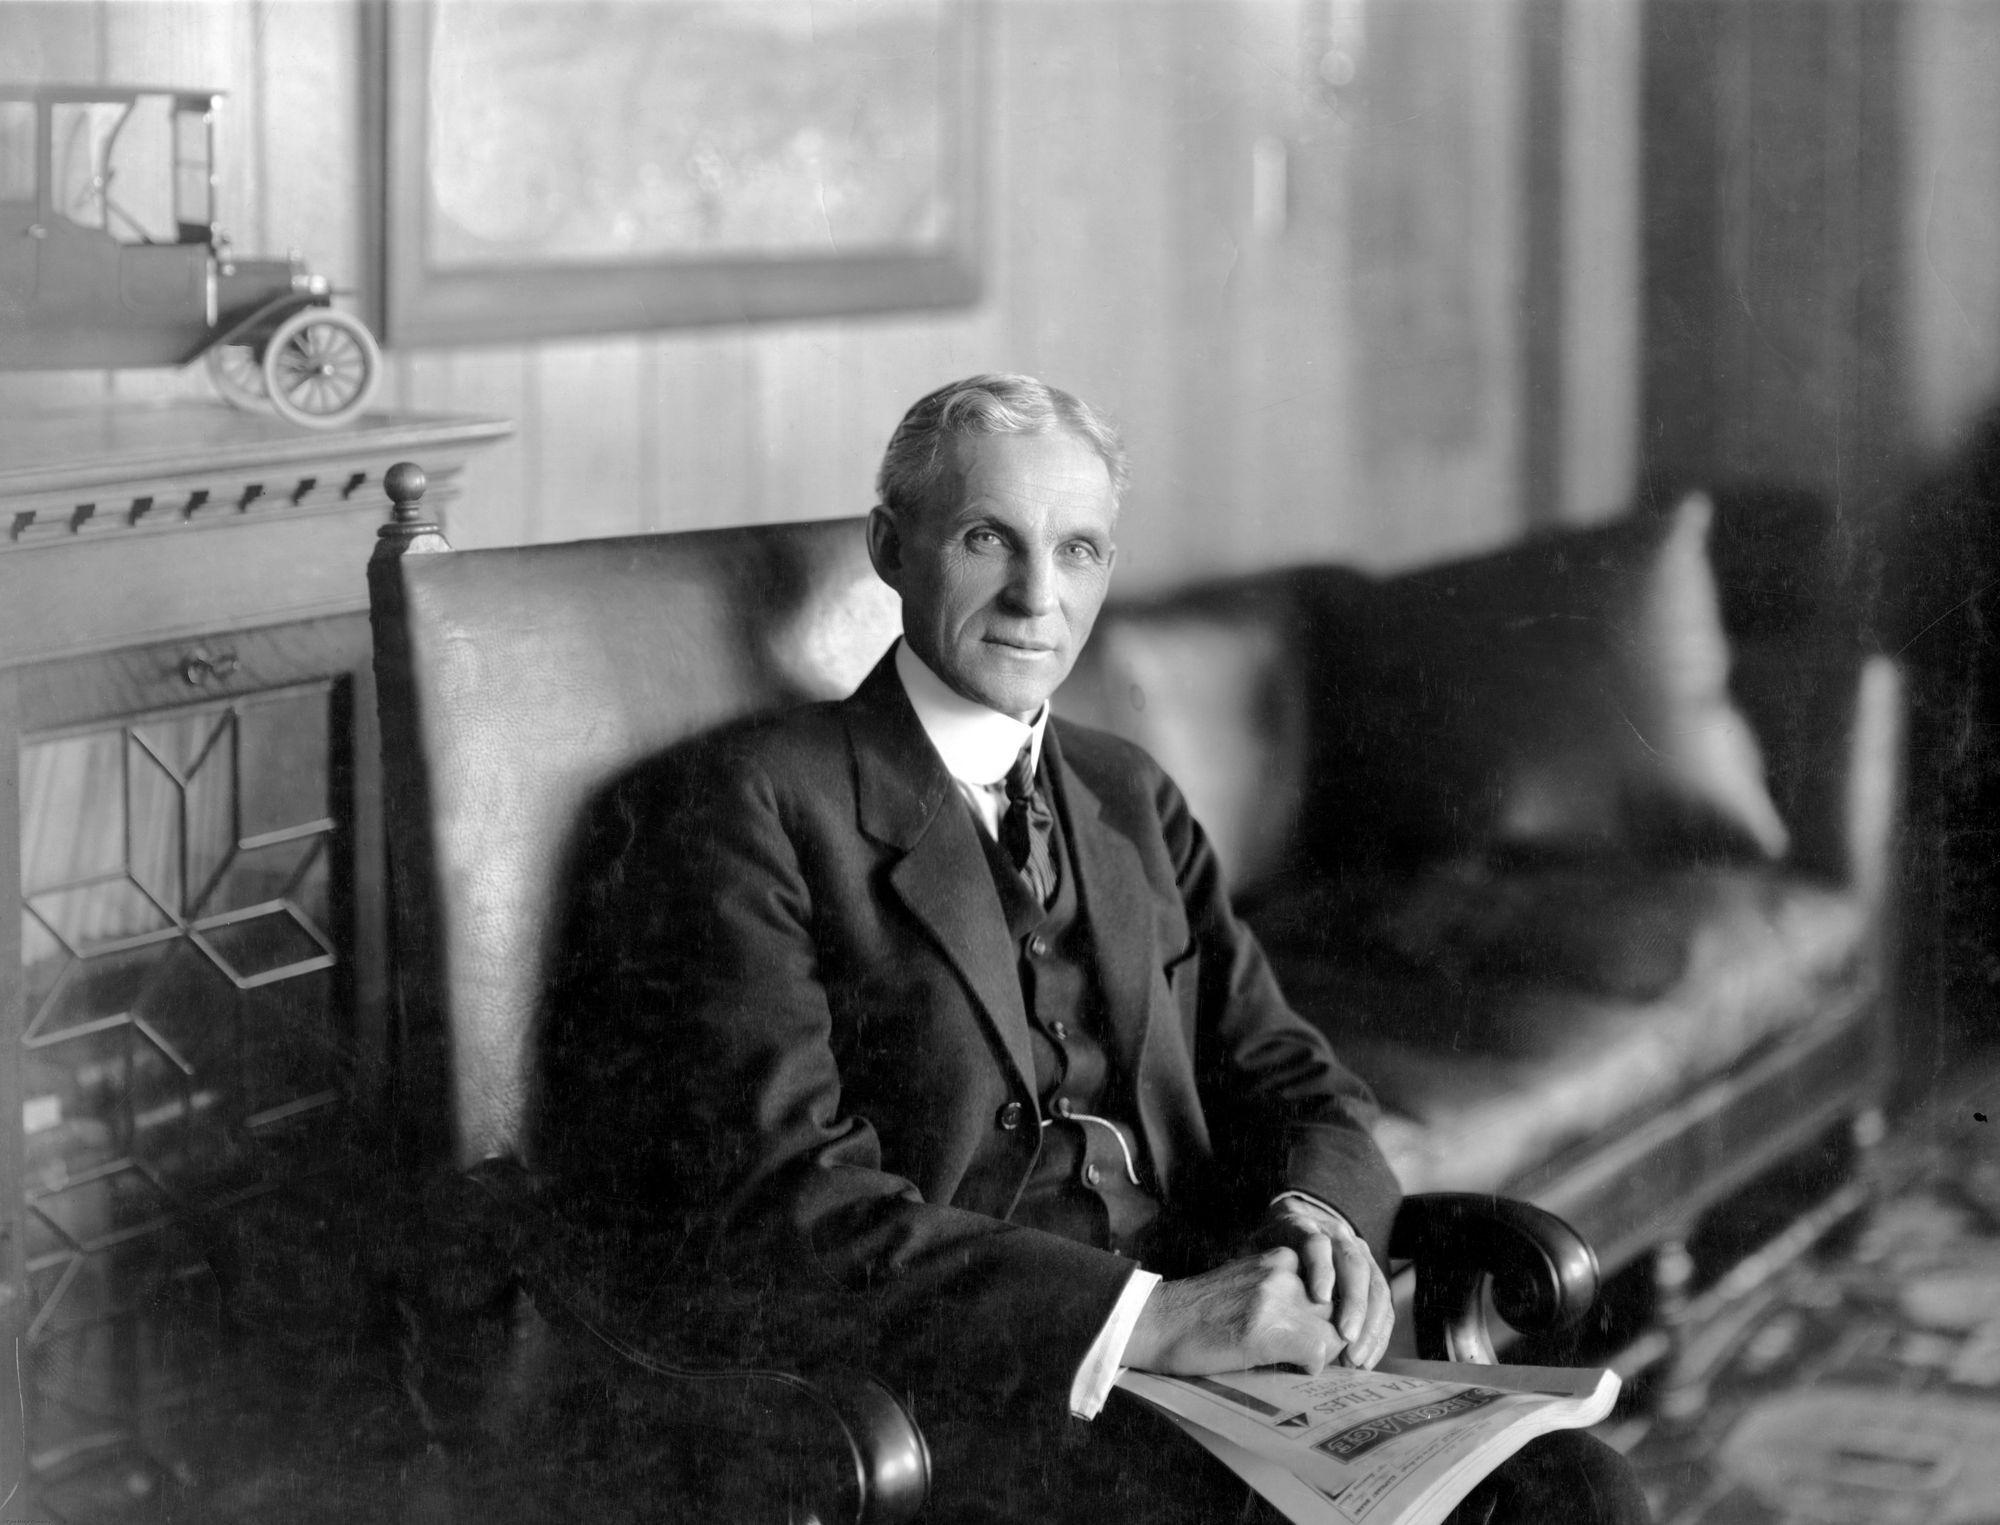 Ге́нри Форд (англ. Henry Ford; 30 июля 1863 — 7 апреля